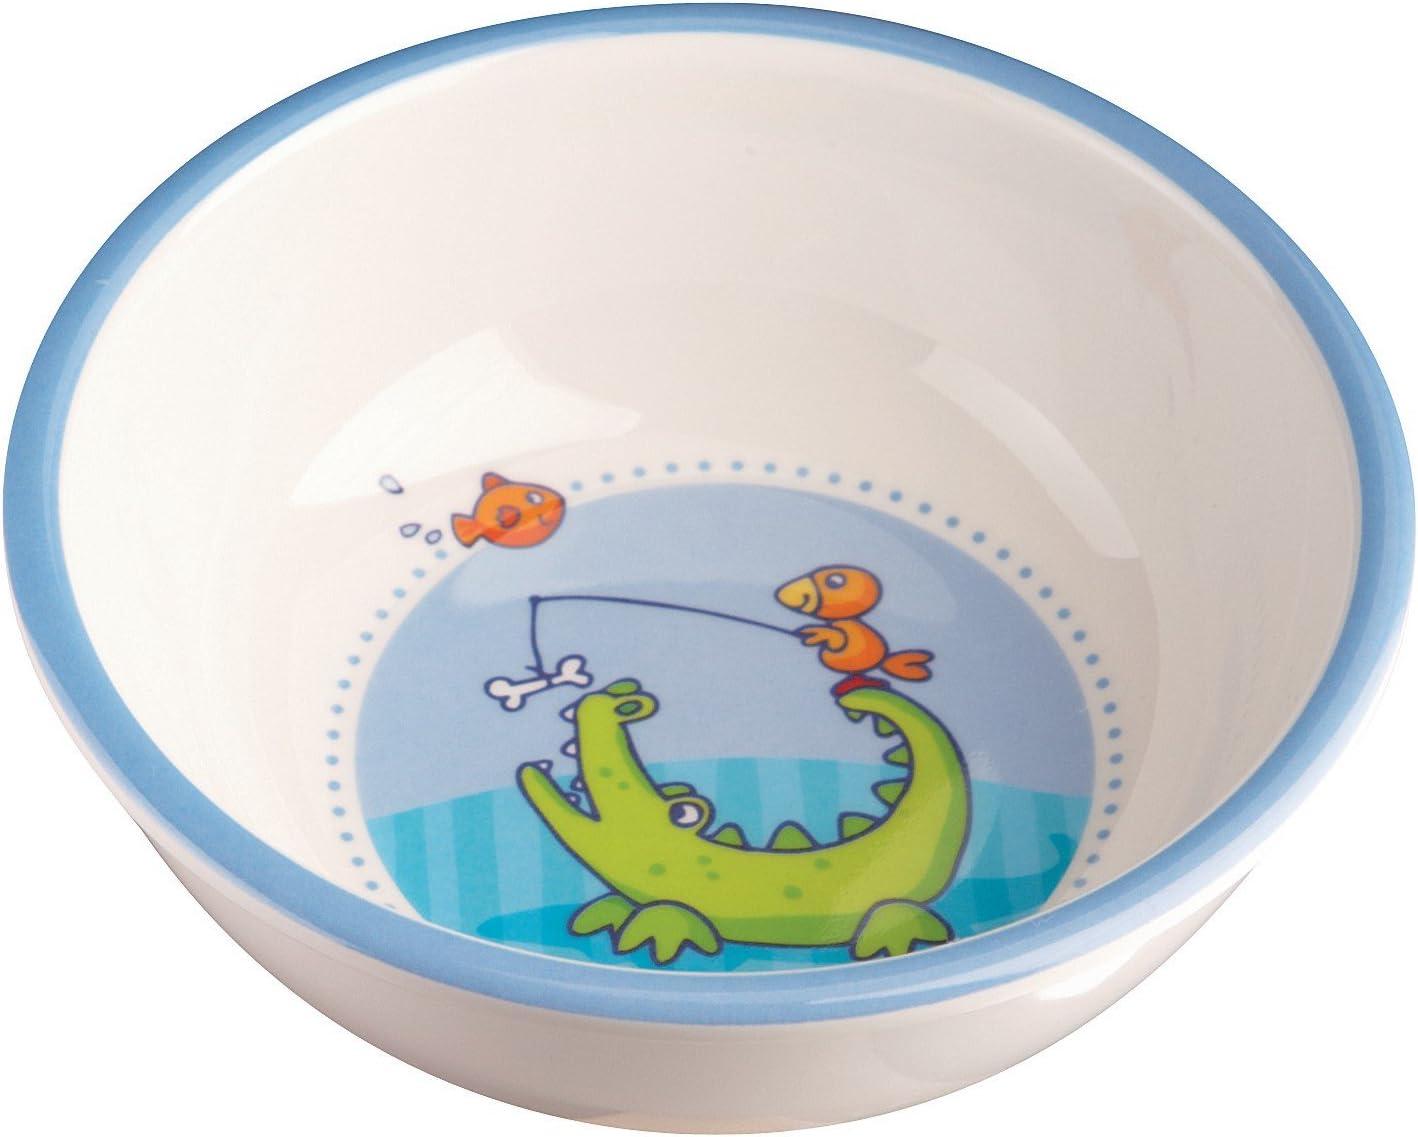 Ustensiles pour Enfants Bol en M/élamine sans BPA /él/éphant Serie BabyGl/ück